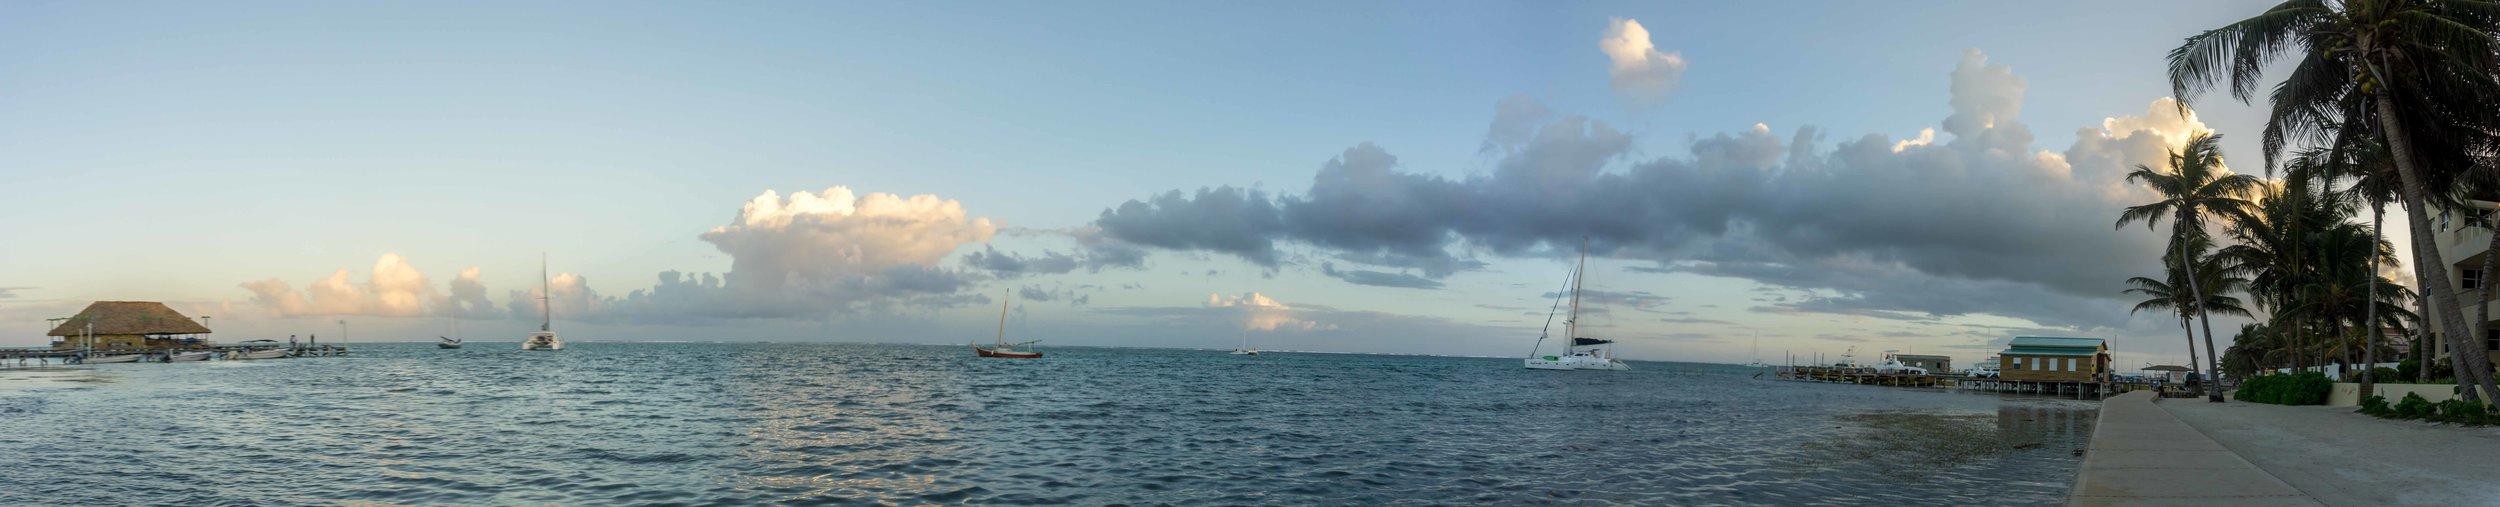 Belize-143.jpg